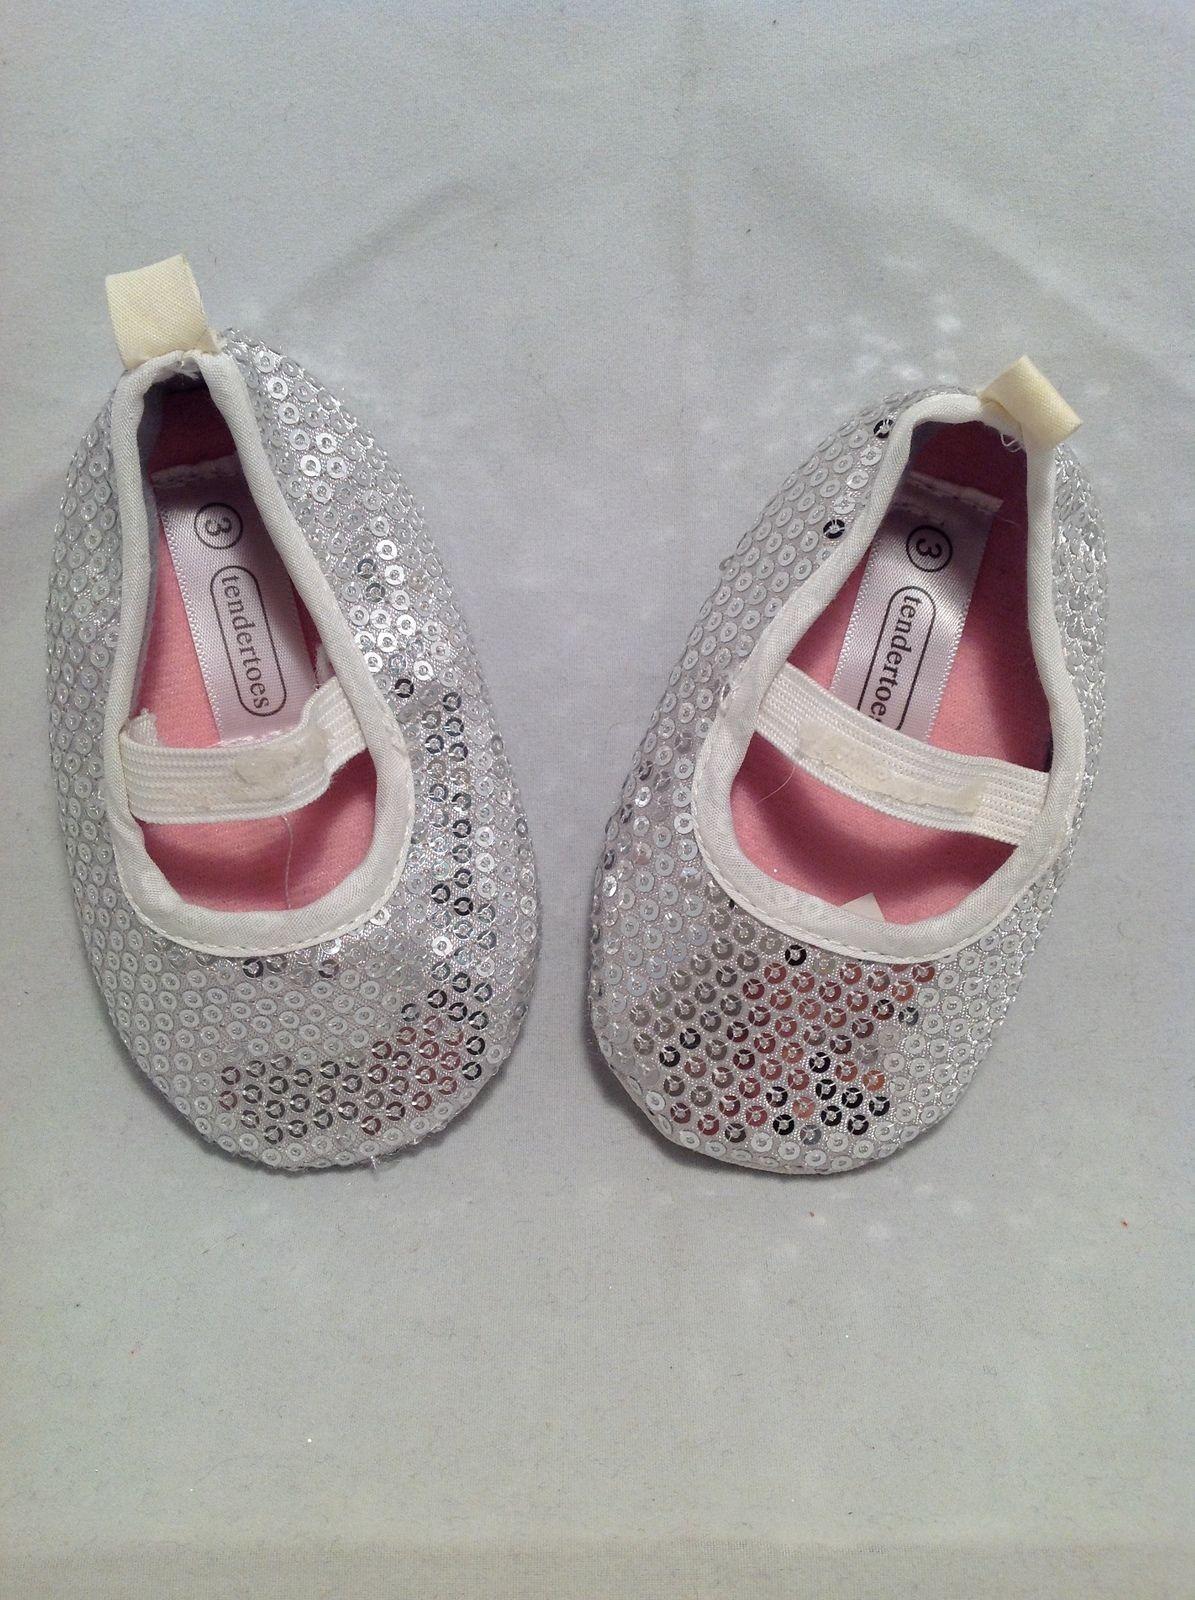 Newborn Girl Baby Shoes Booties Set Months